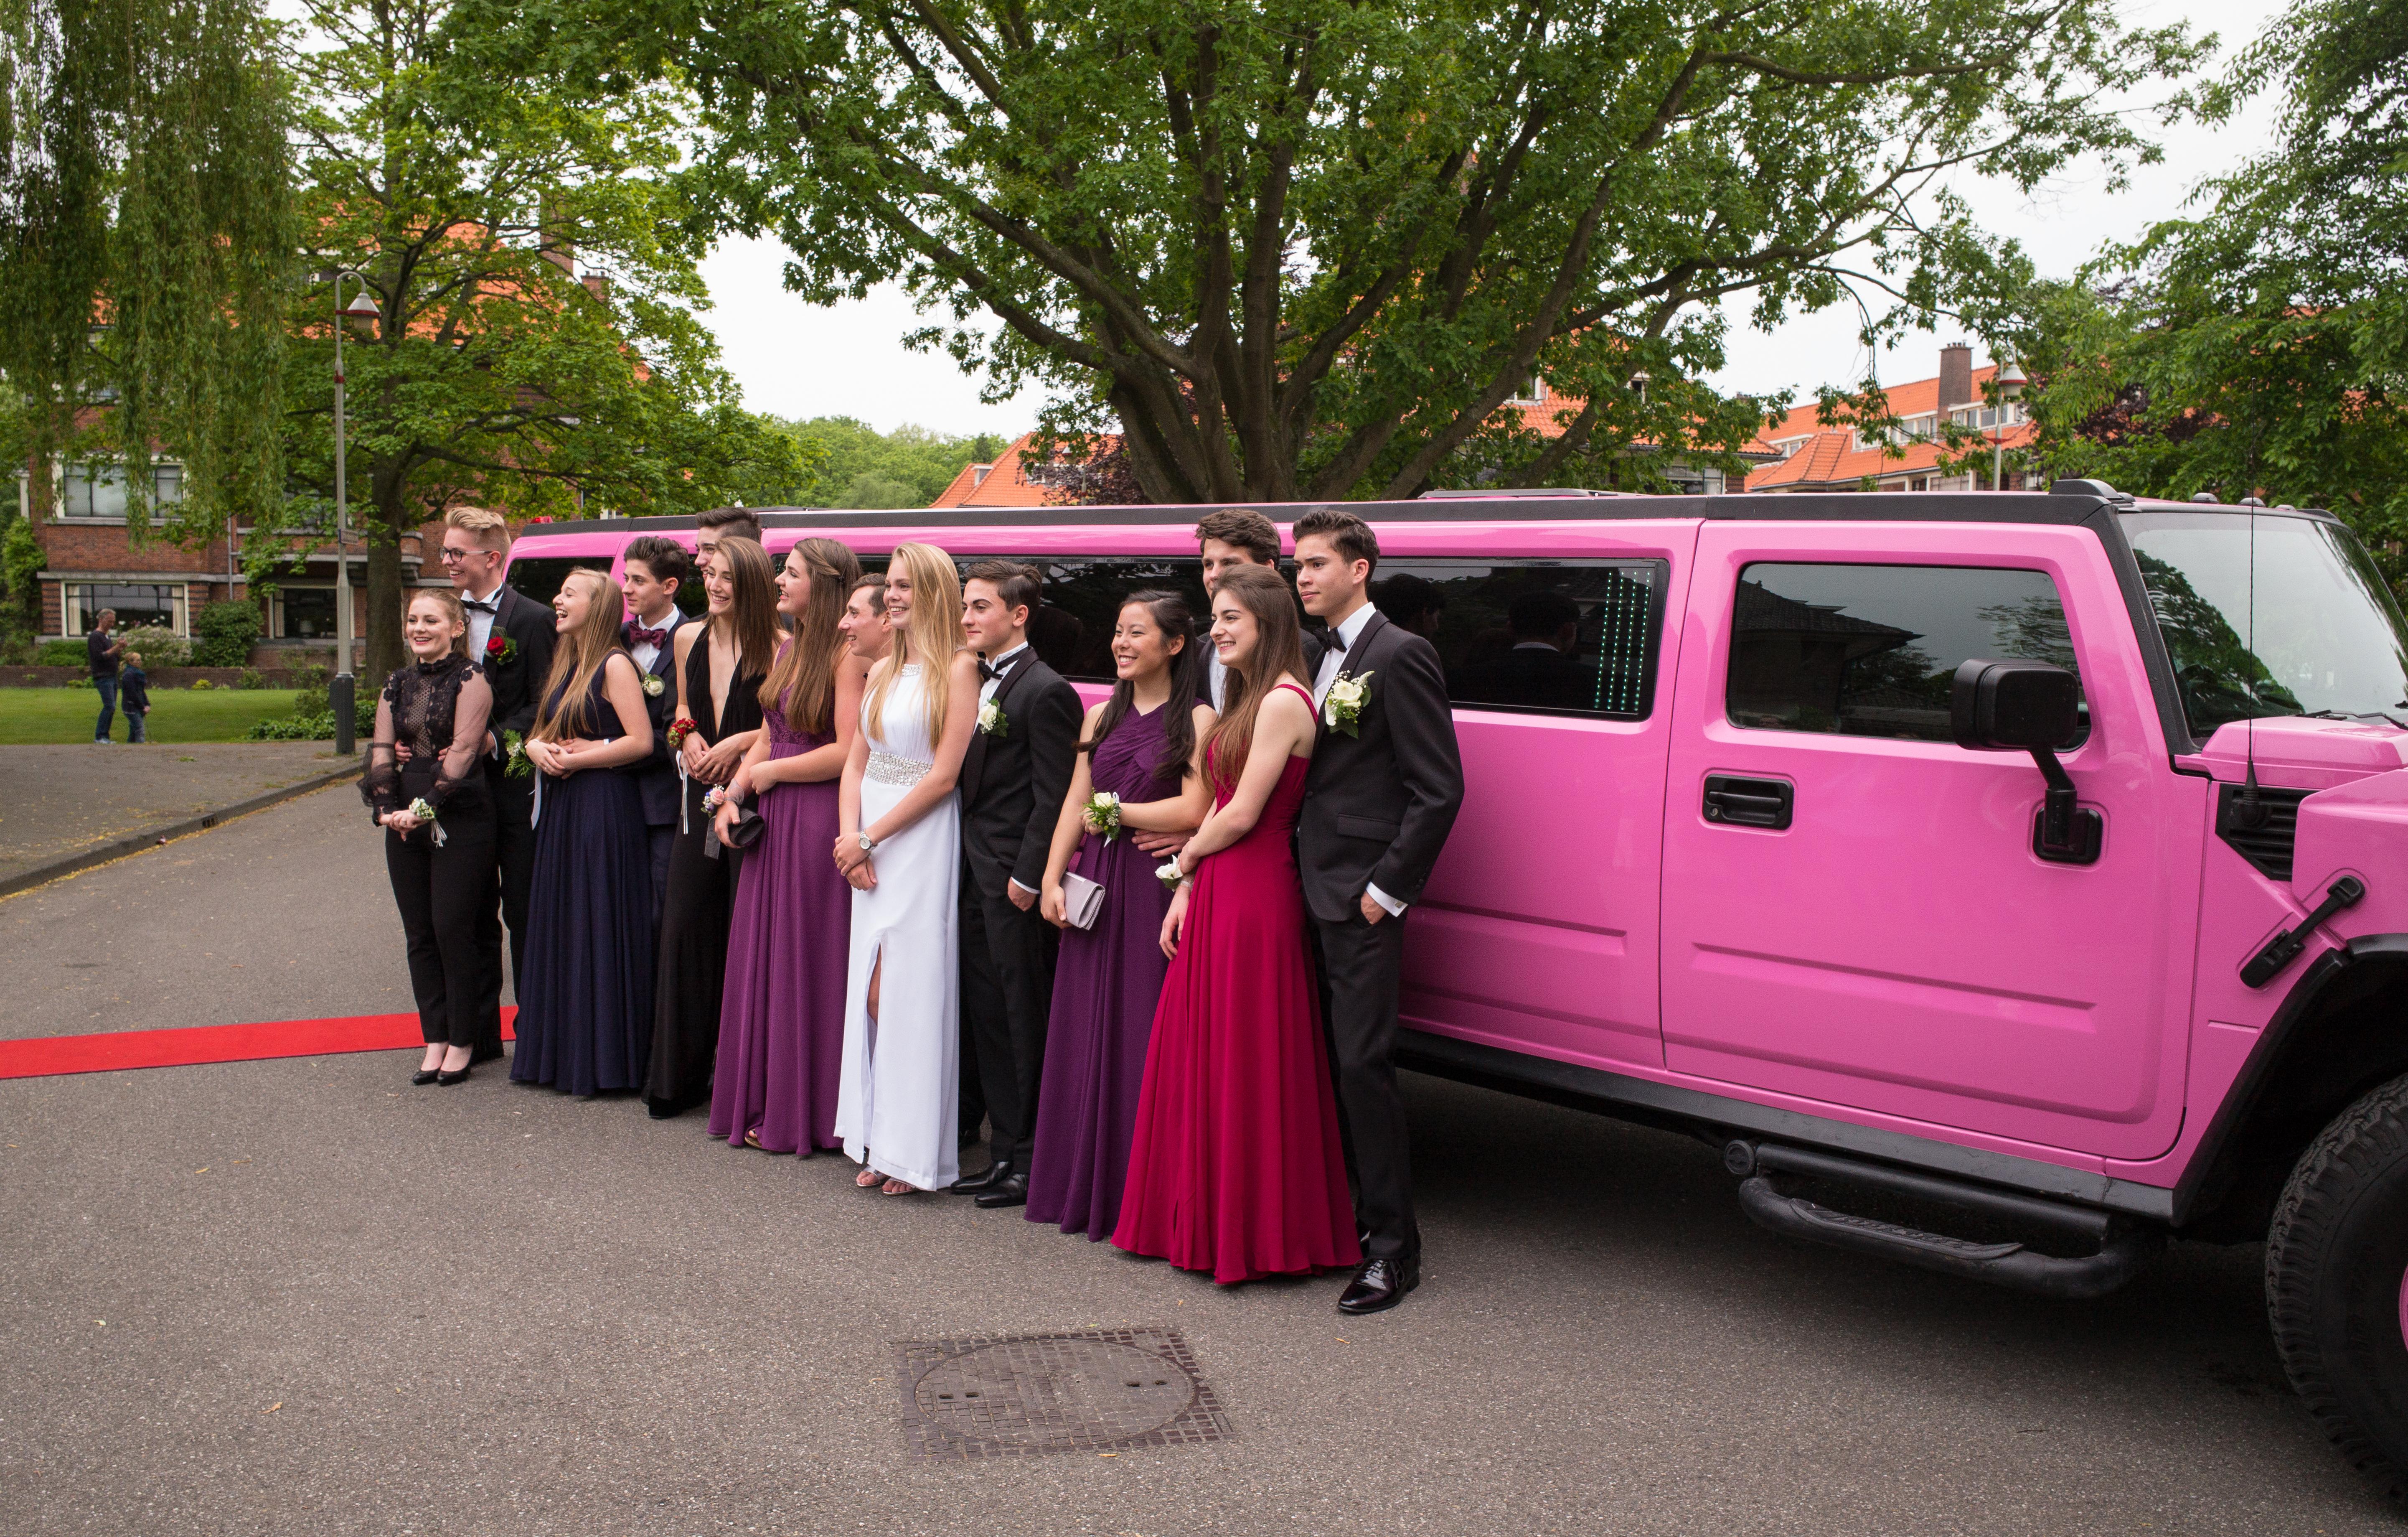 b996d6c78bb girl car boy europe portrait high vehicle tuxedo bowtie holland hague  netherlands m dress students party